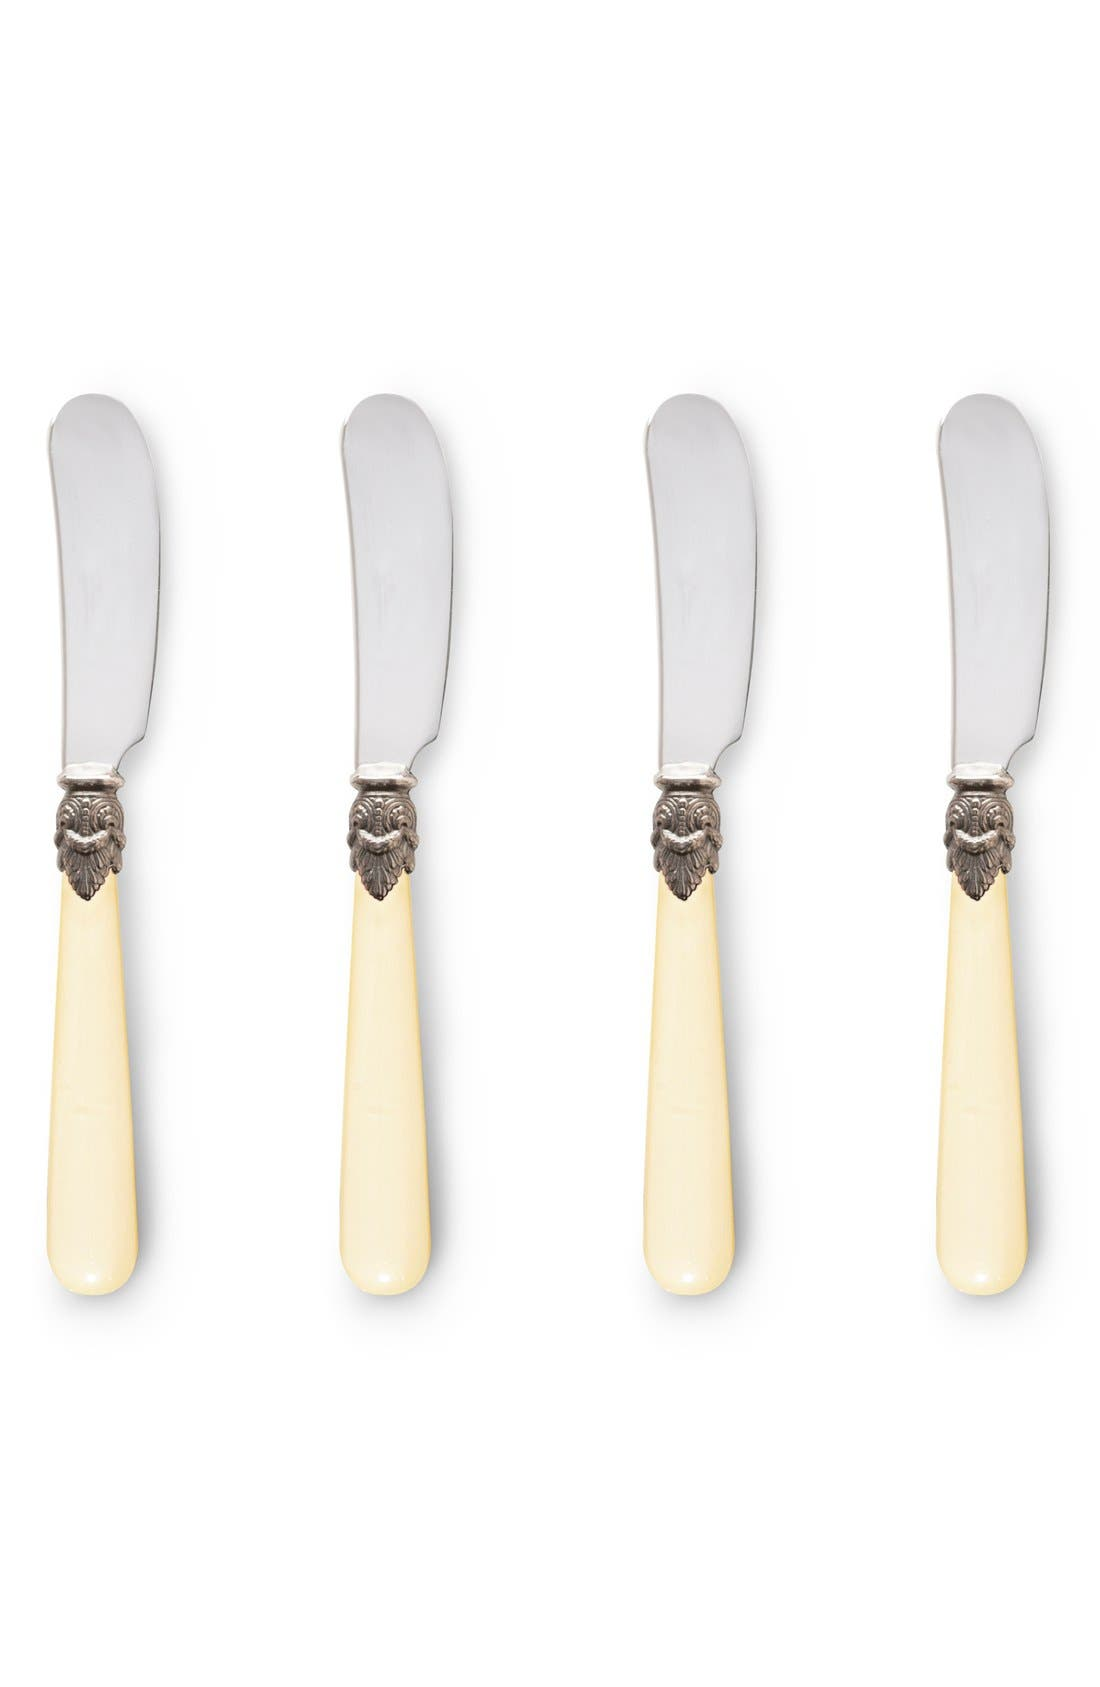 Rosanna 'Napoleon' Pate Knives (Set of 4)